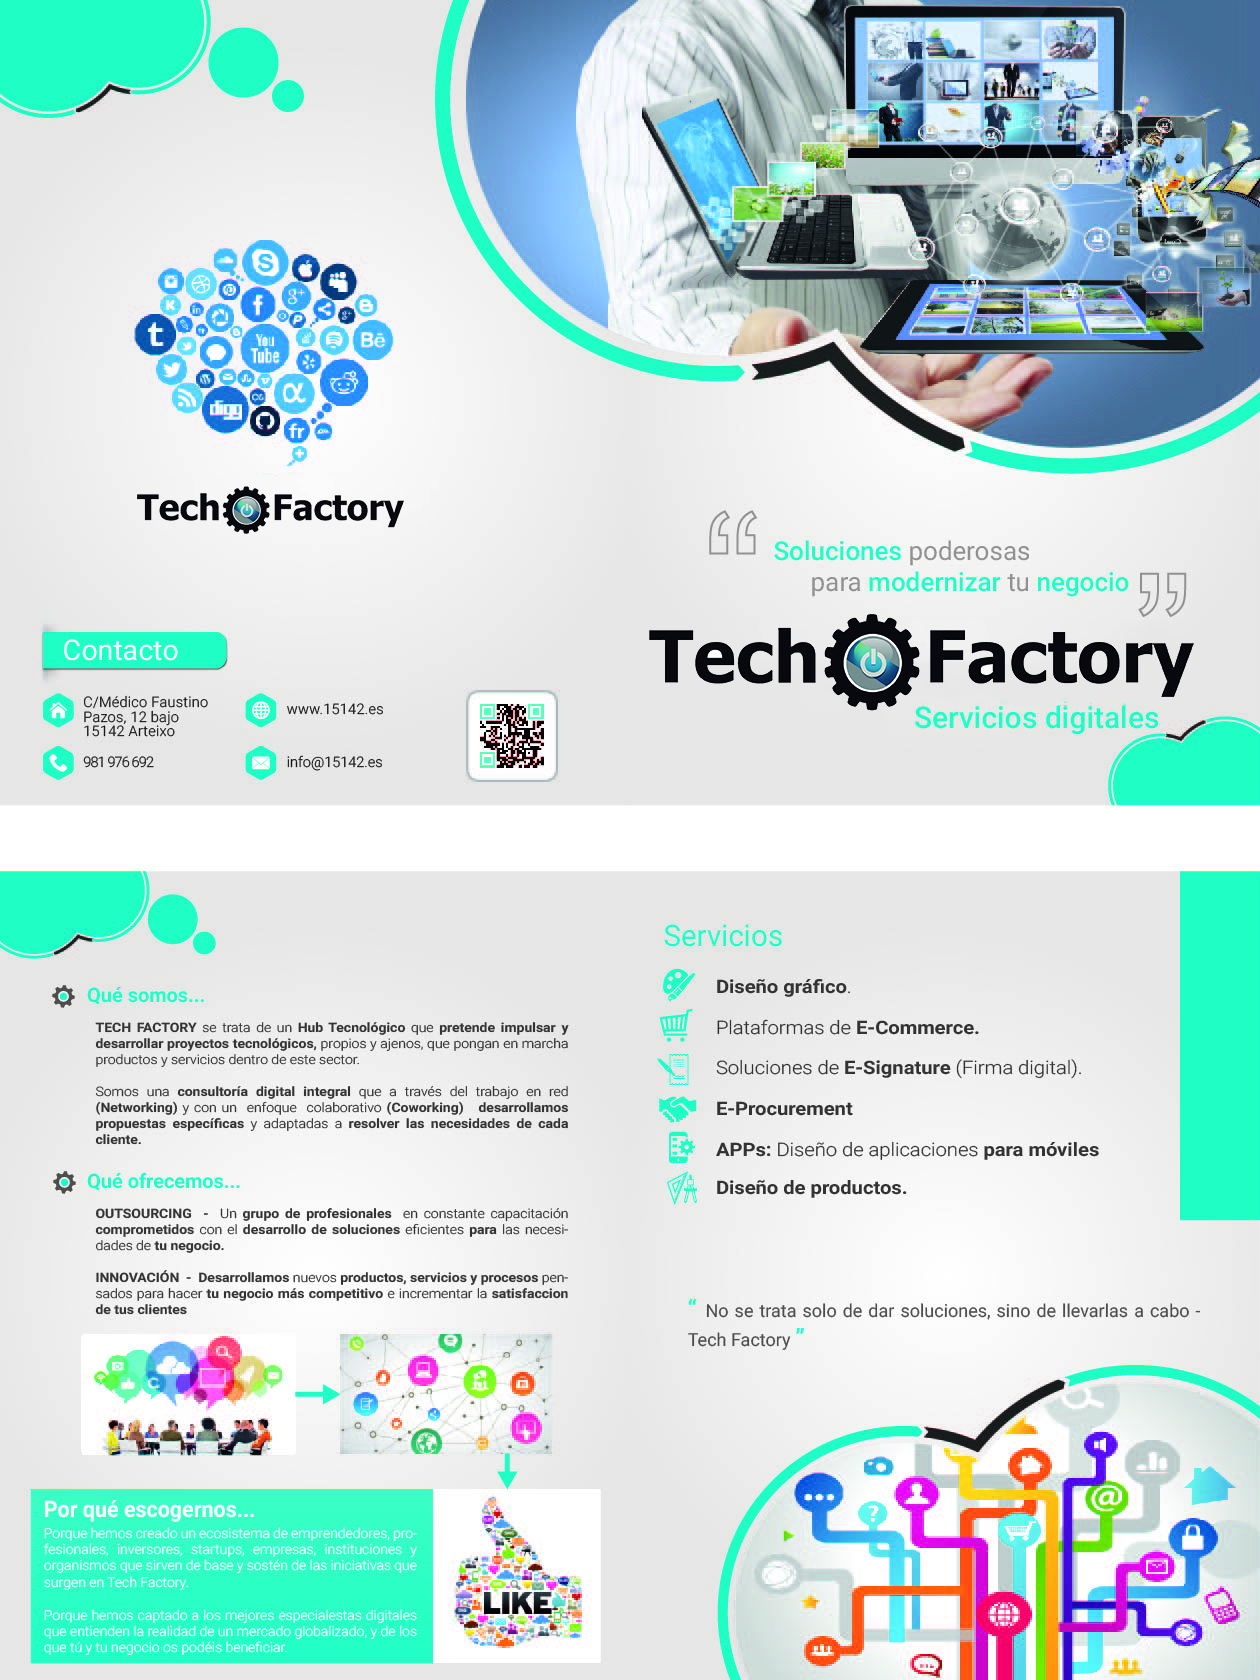 Tech Factory TIC arteixo 15142 coworking